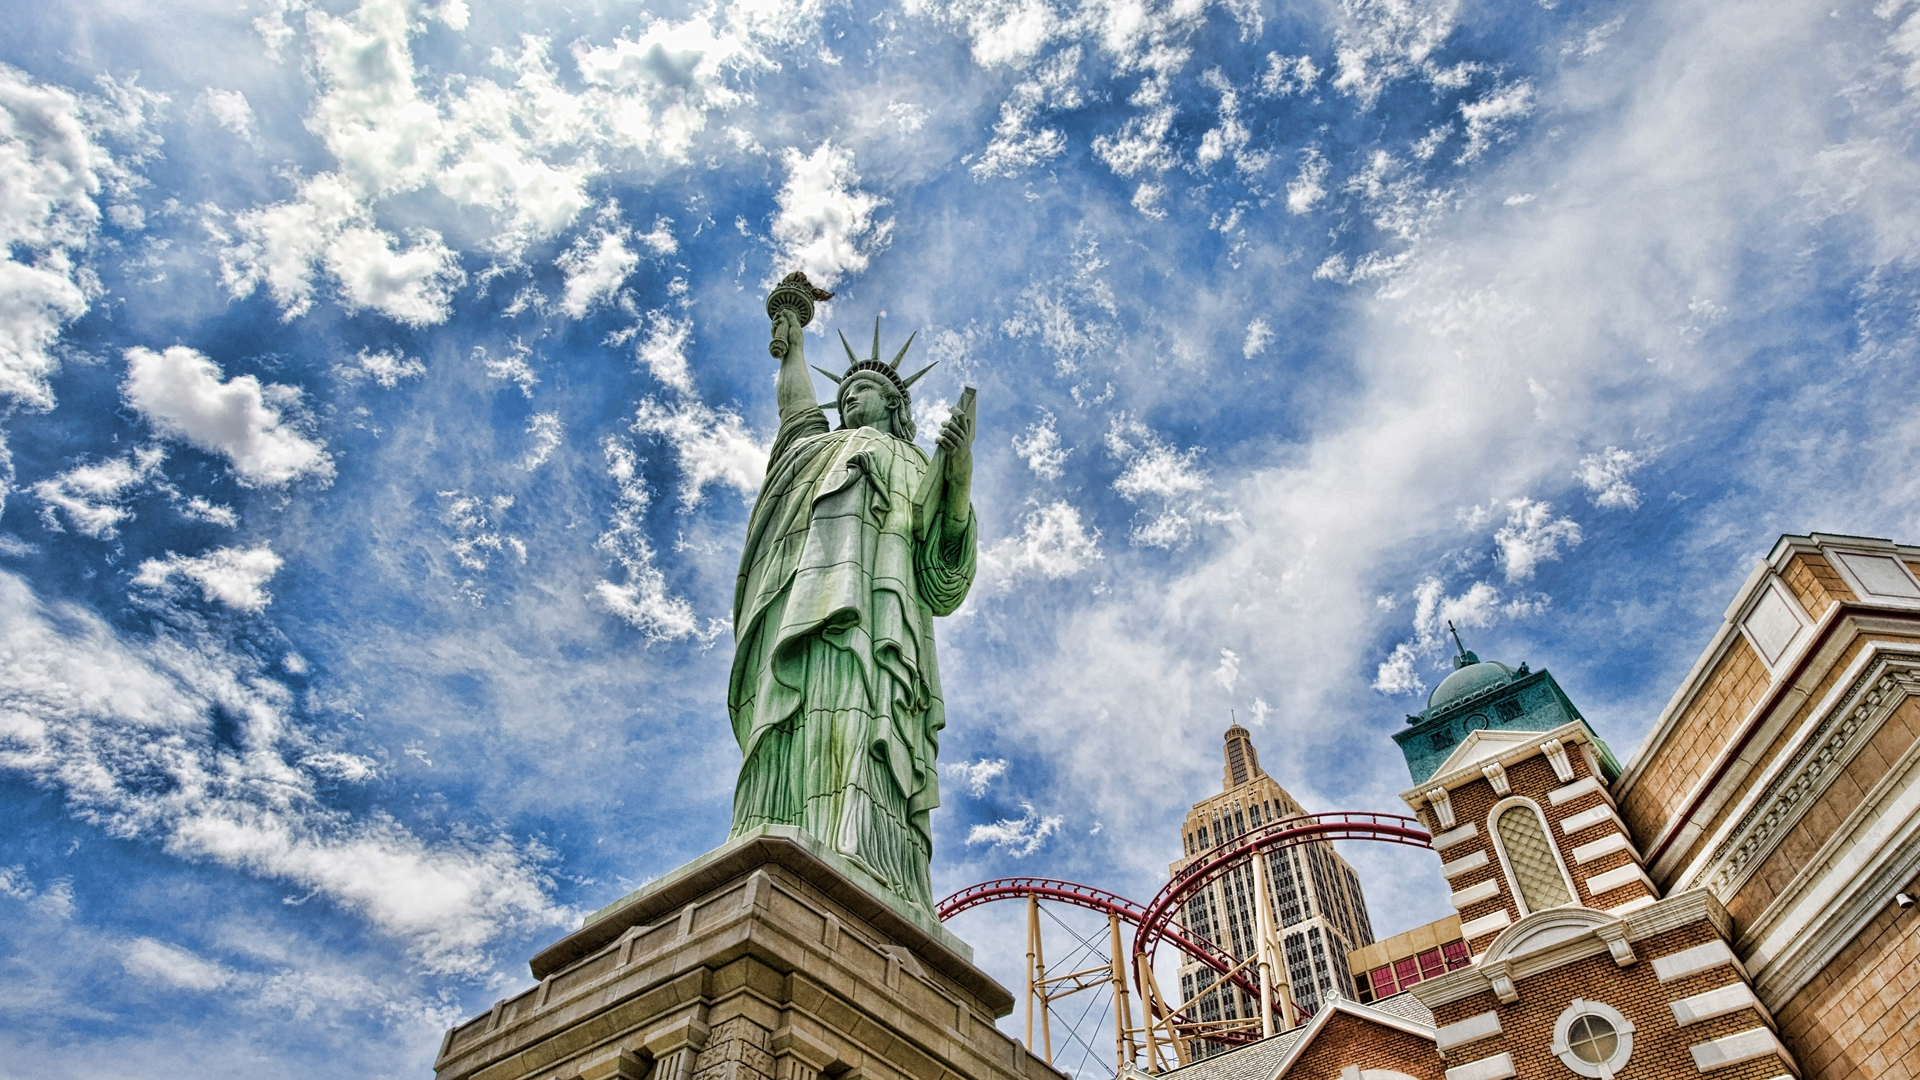 Falling Water Wallpaper Free Download Statue Of Liberty In New York Hd Wallpaper Pixelstalk Net